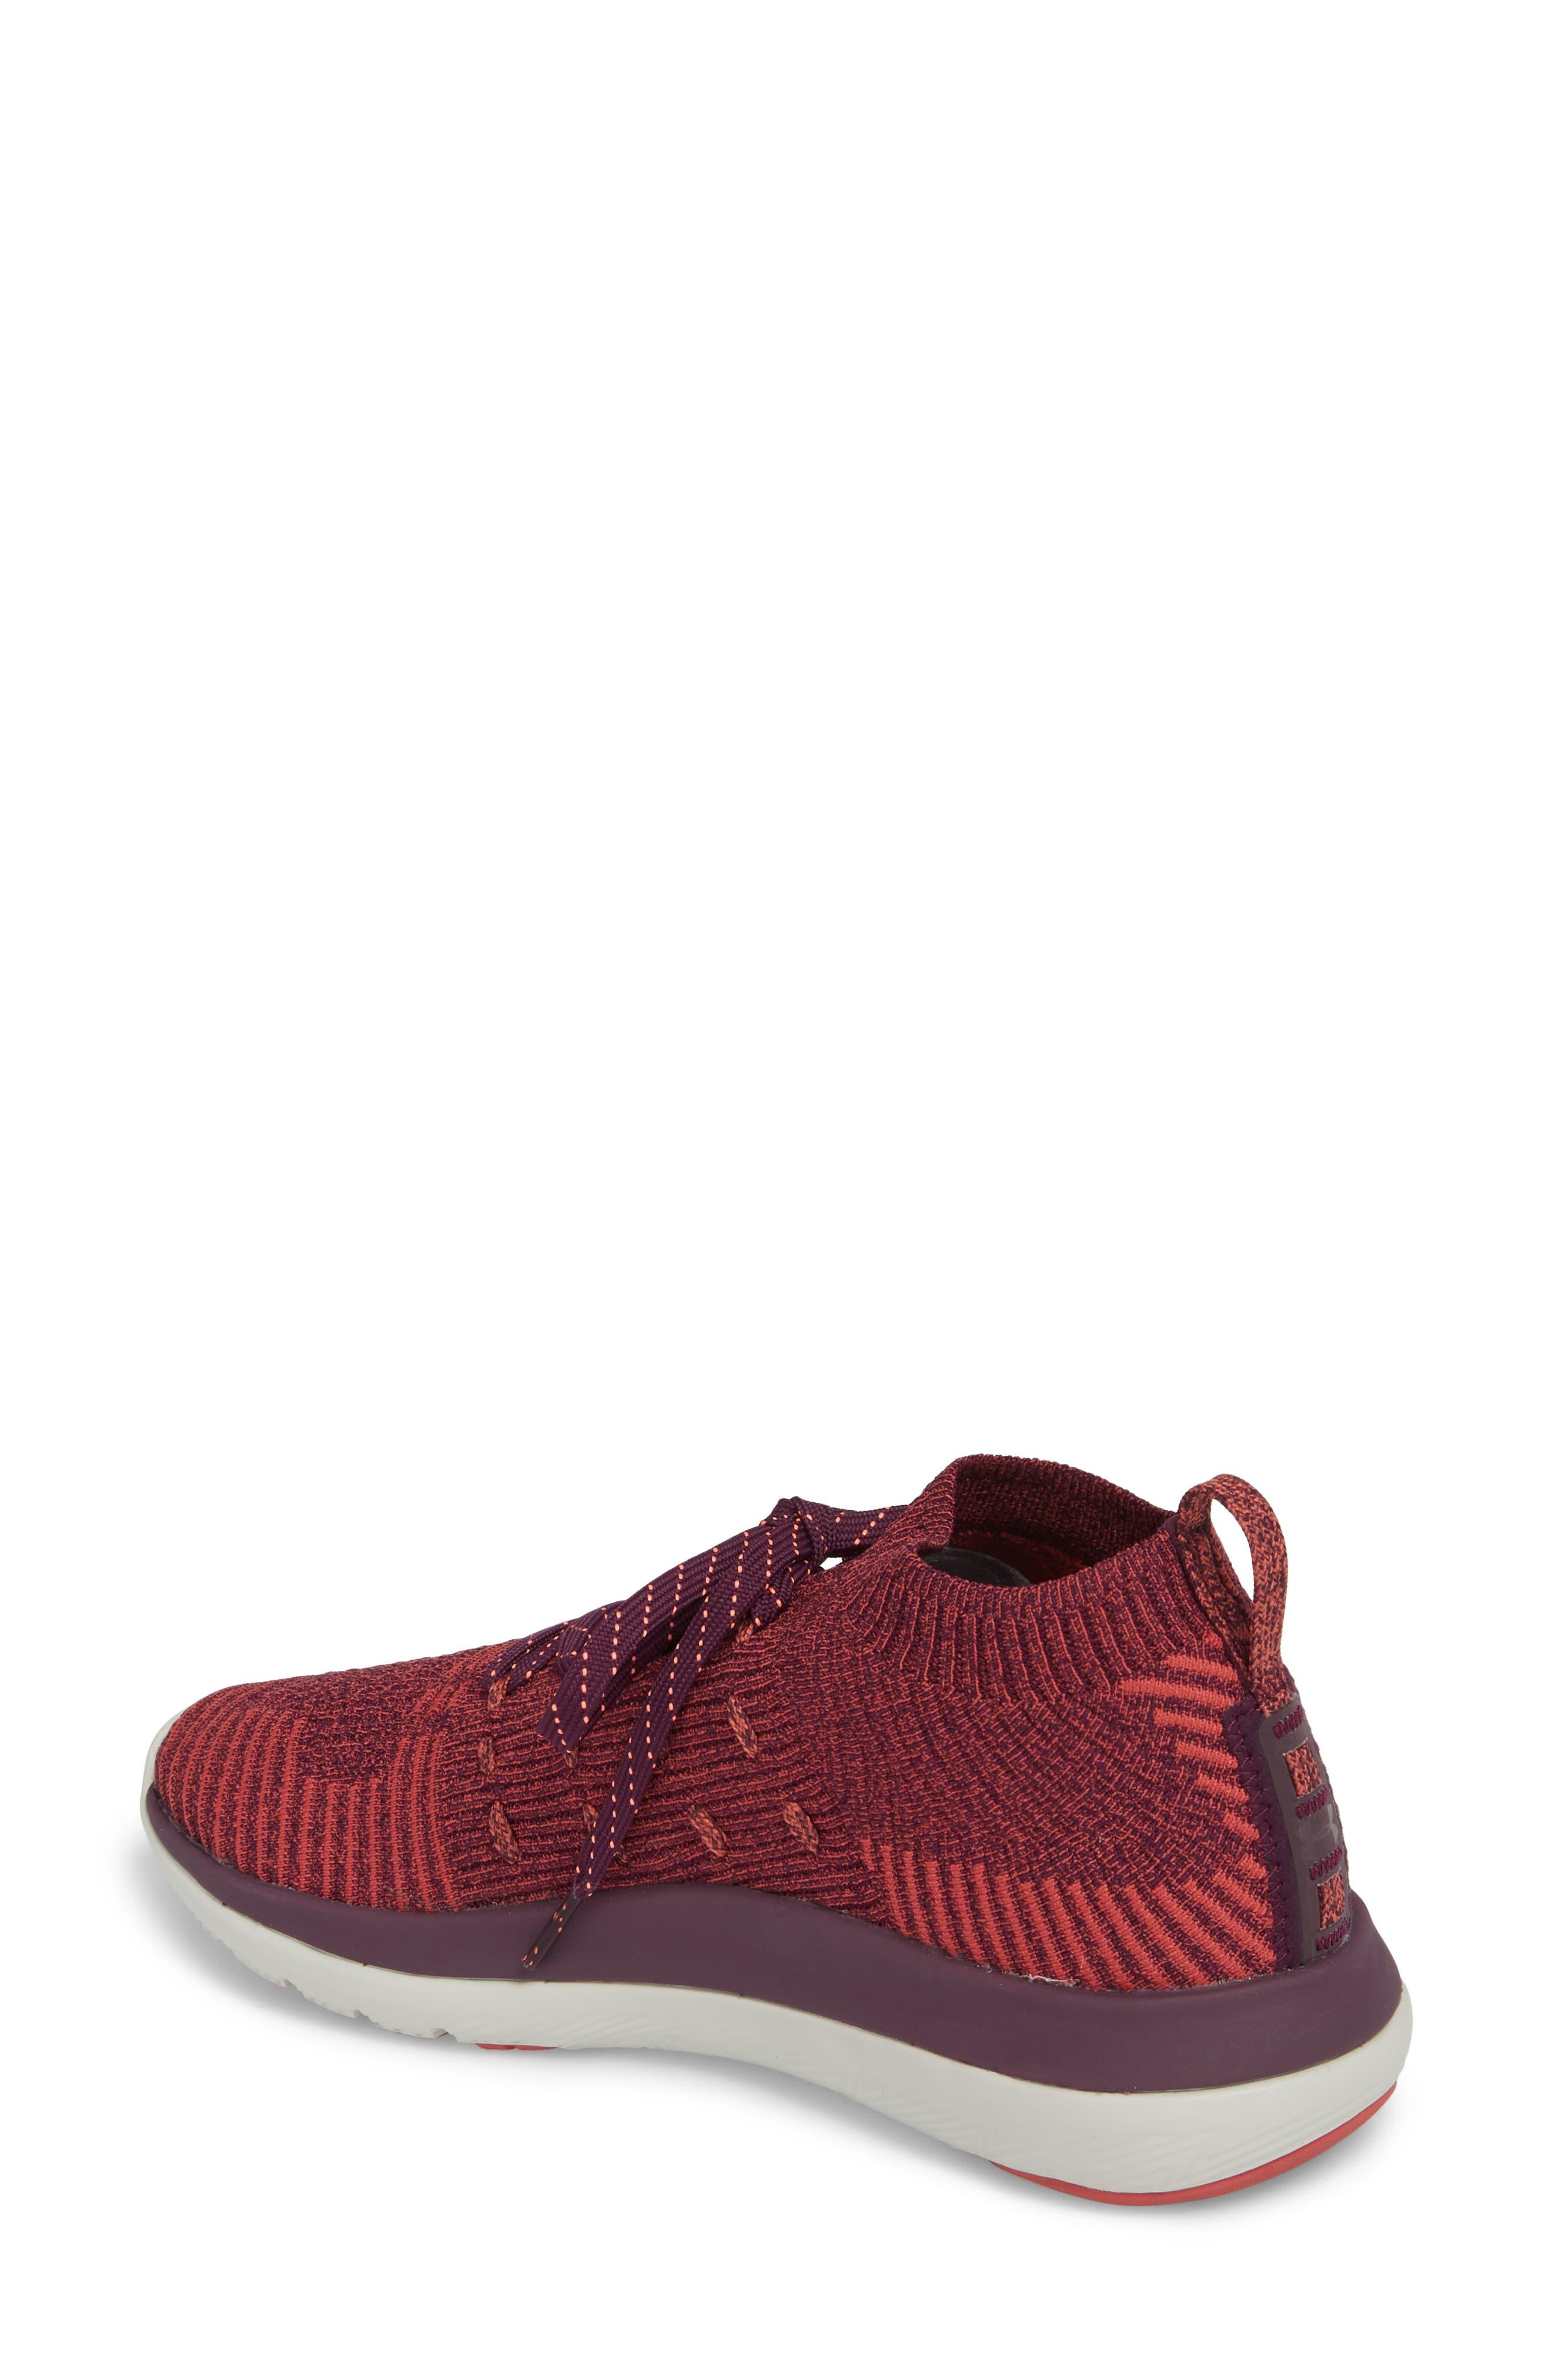 Slingflex Rise Sneaker,                             Alternate thumbnail 2, color,                             Merlot/ Rustic Red/ Brilliance